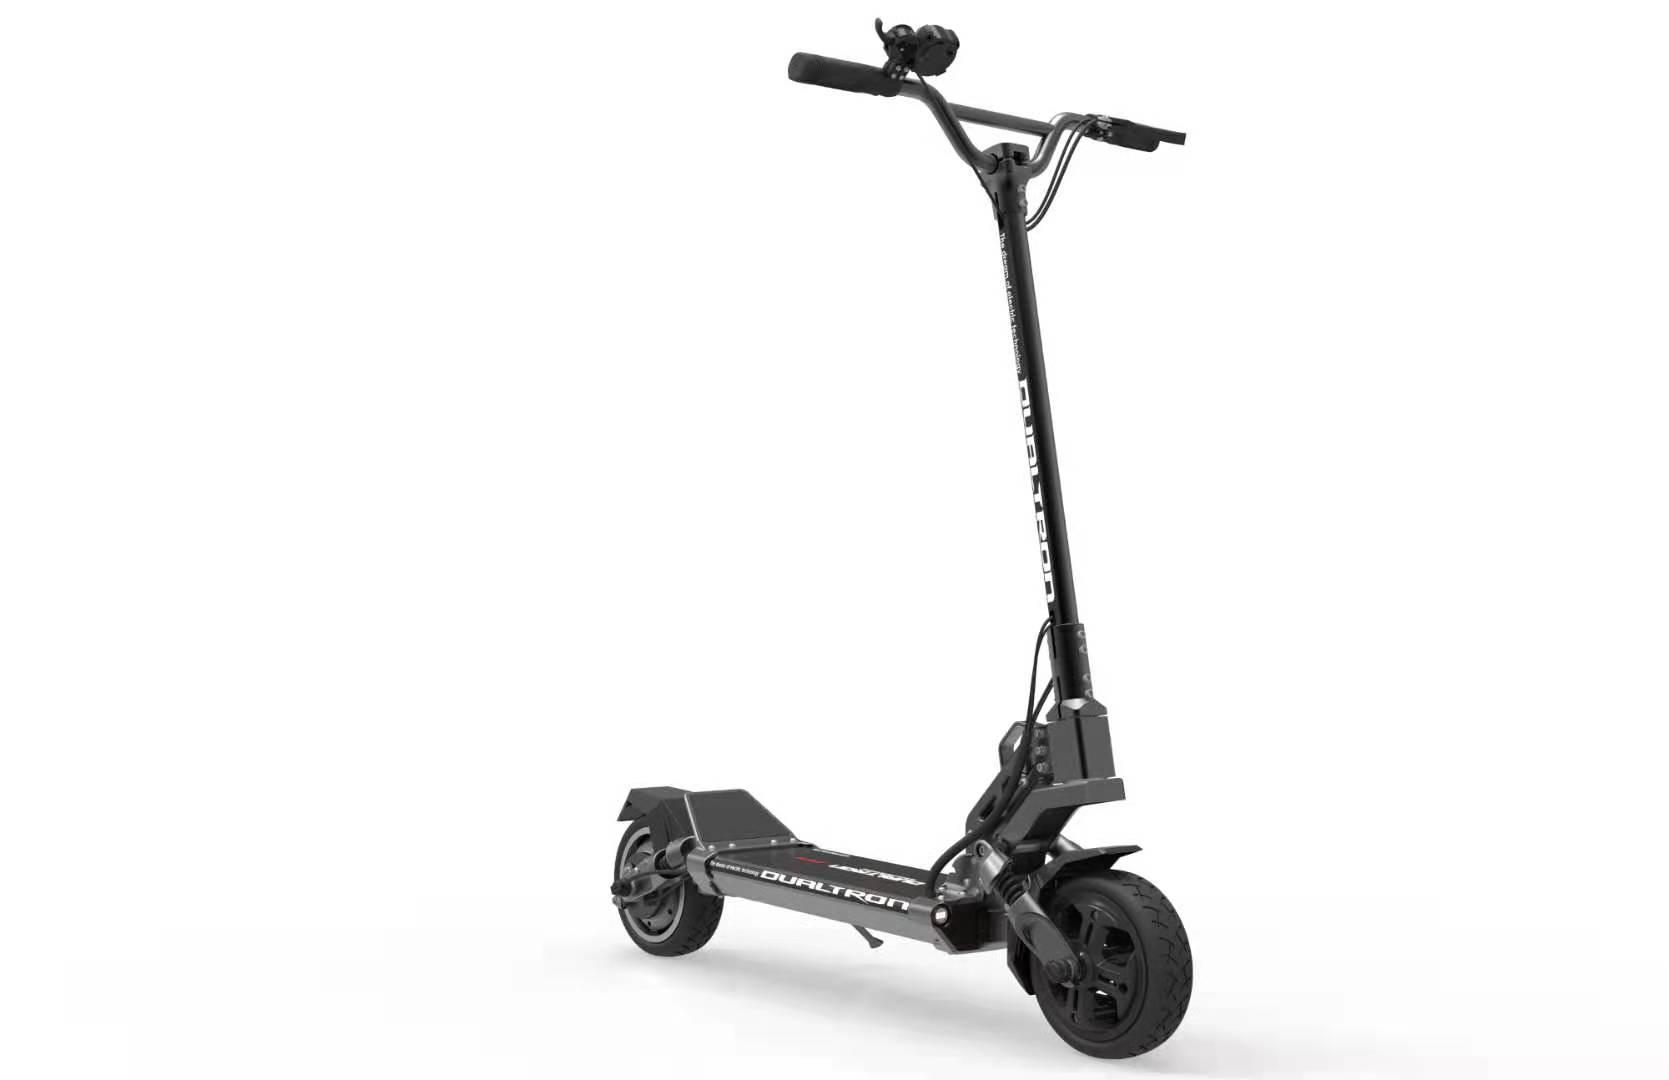 WE-WIN 200x50mm 8 Scooter el/éctrico neum/ático Macizo Rueda Trasera neum/áticos Goma